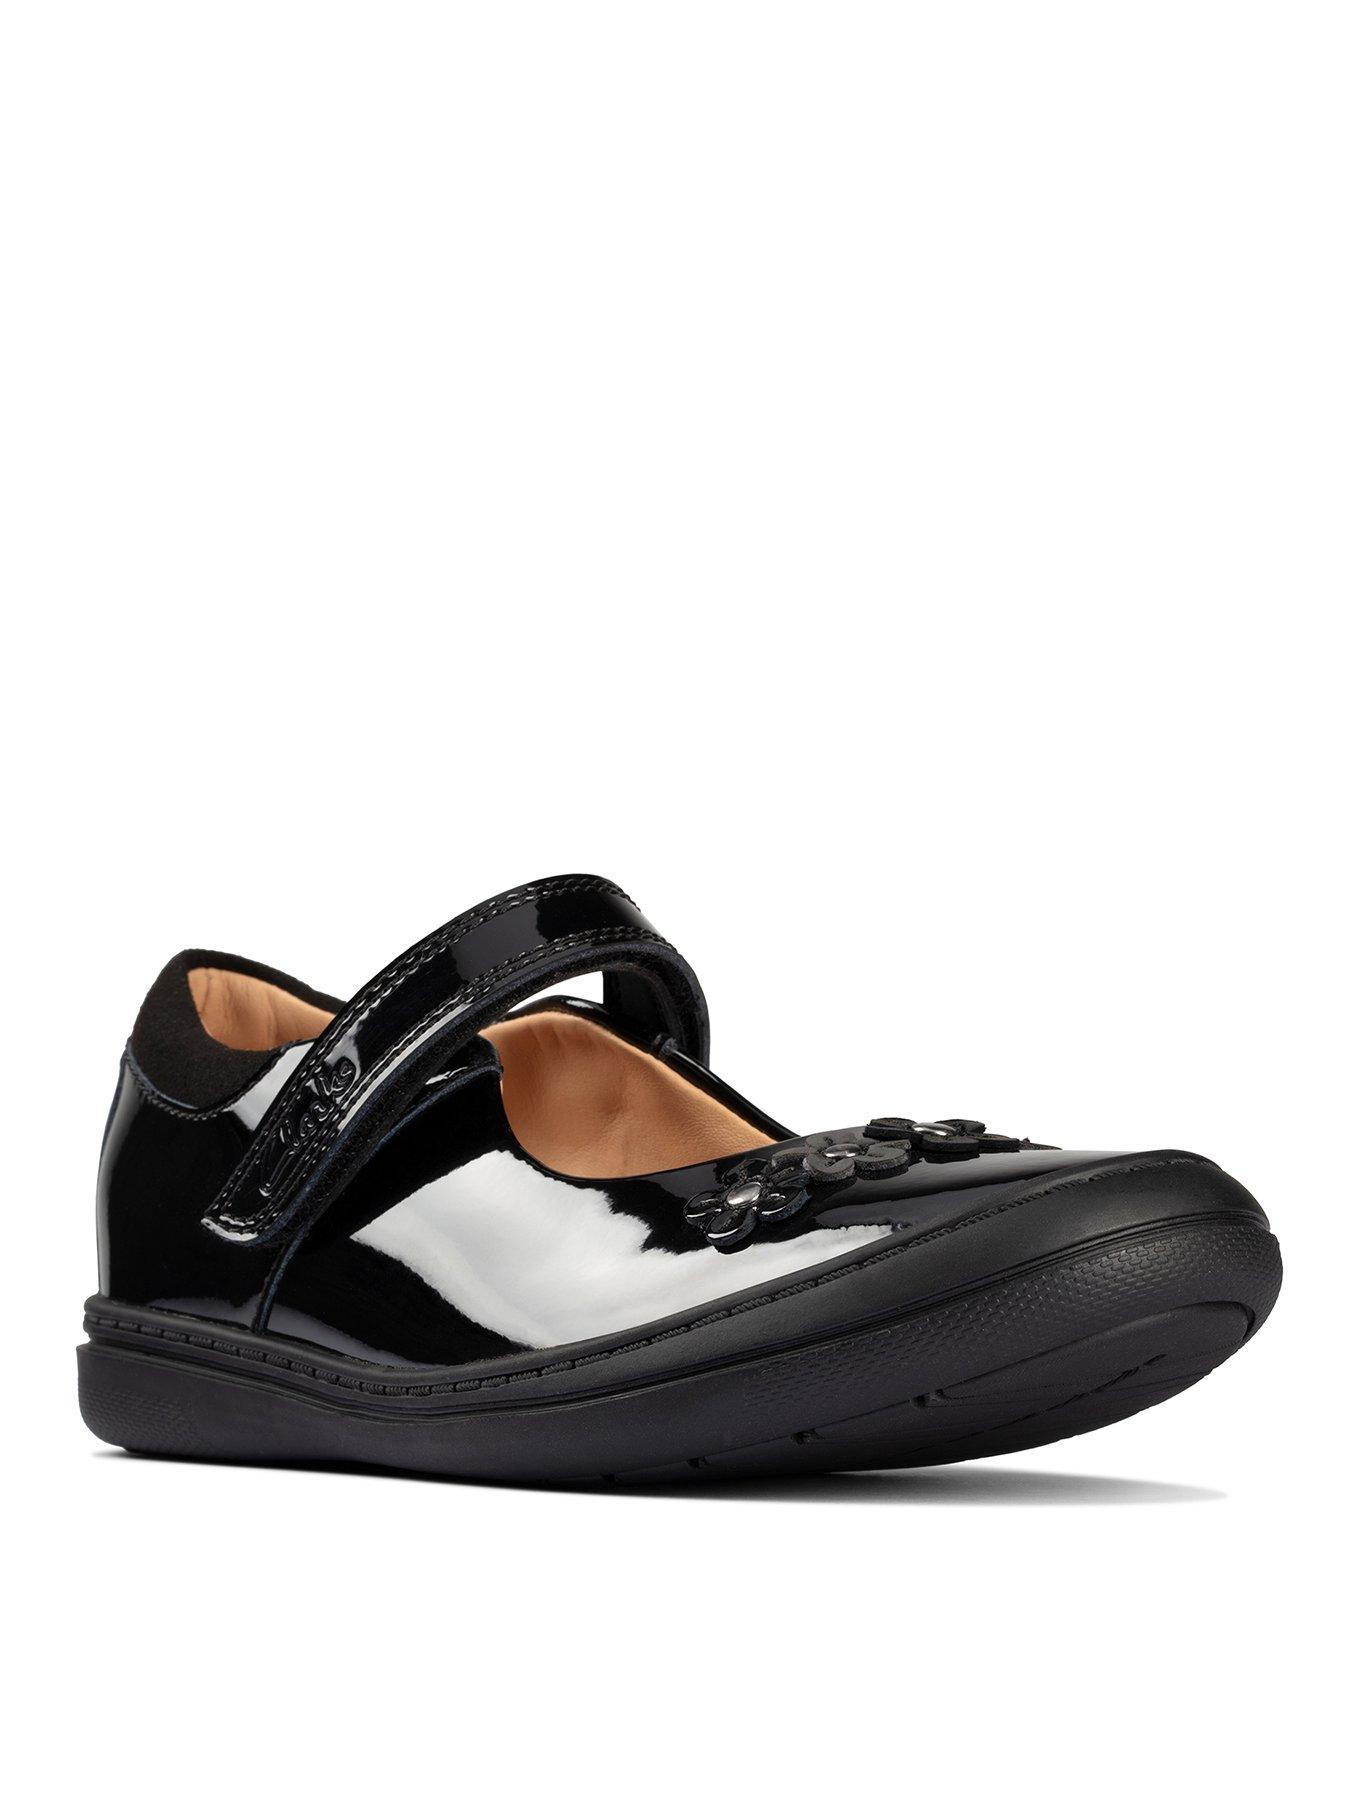 Clarks Kids Shoes | Clarks Childrens